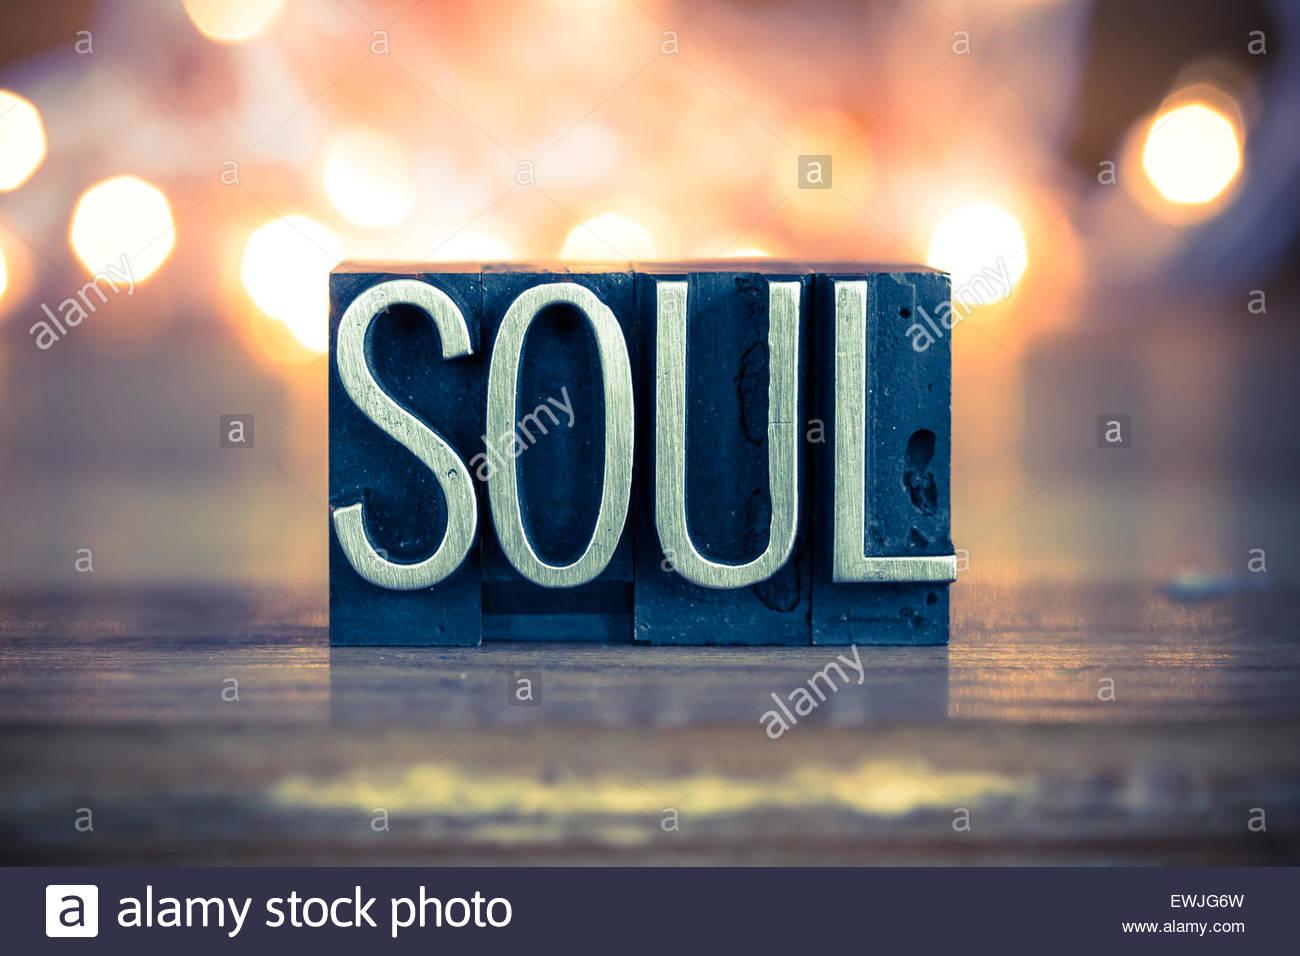 Soul Soulful Salvation Stock Photos Soul Soulful Salvation Stock 1300x956